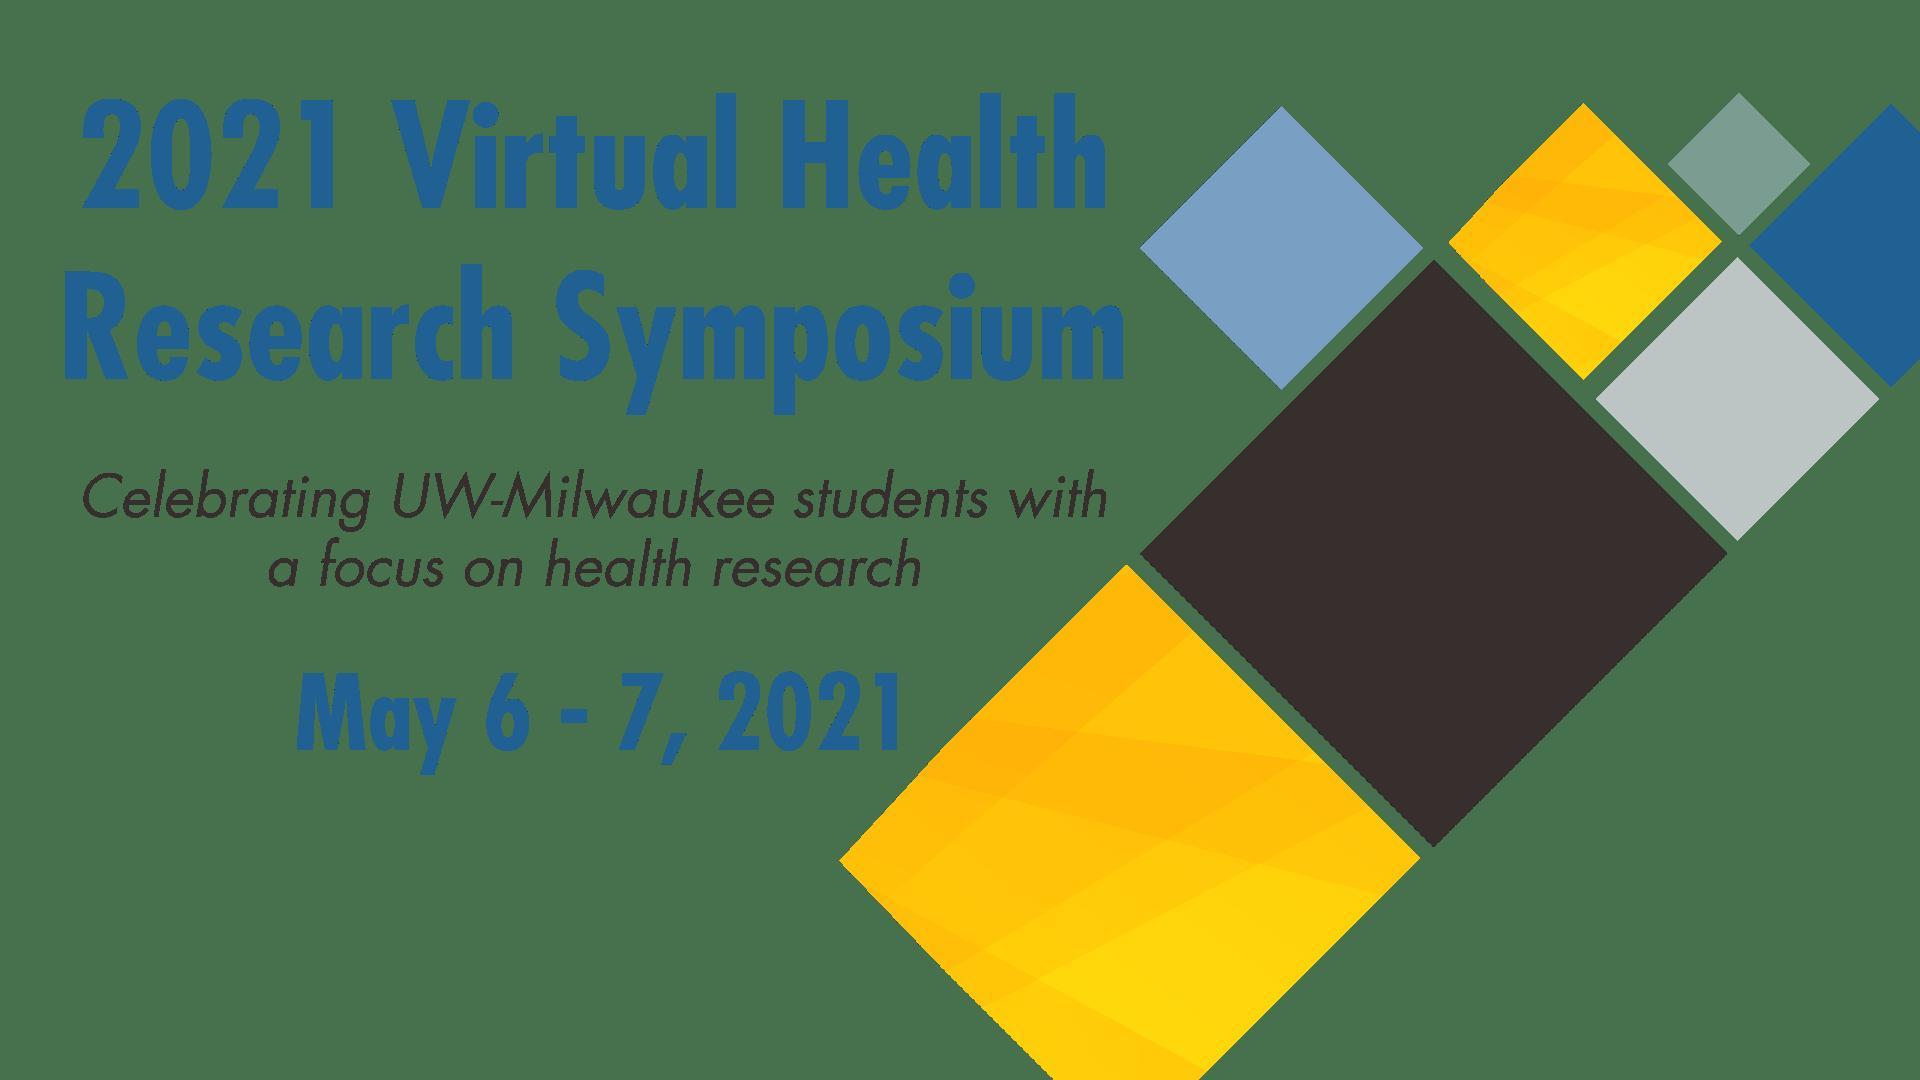 2021 Virtual Health Research Symposium May 6-7 2021